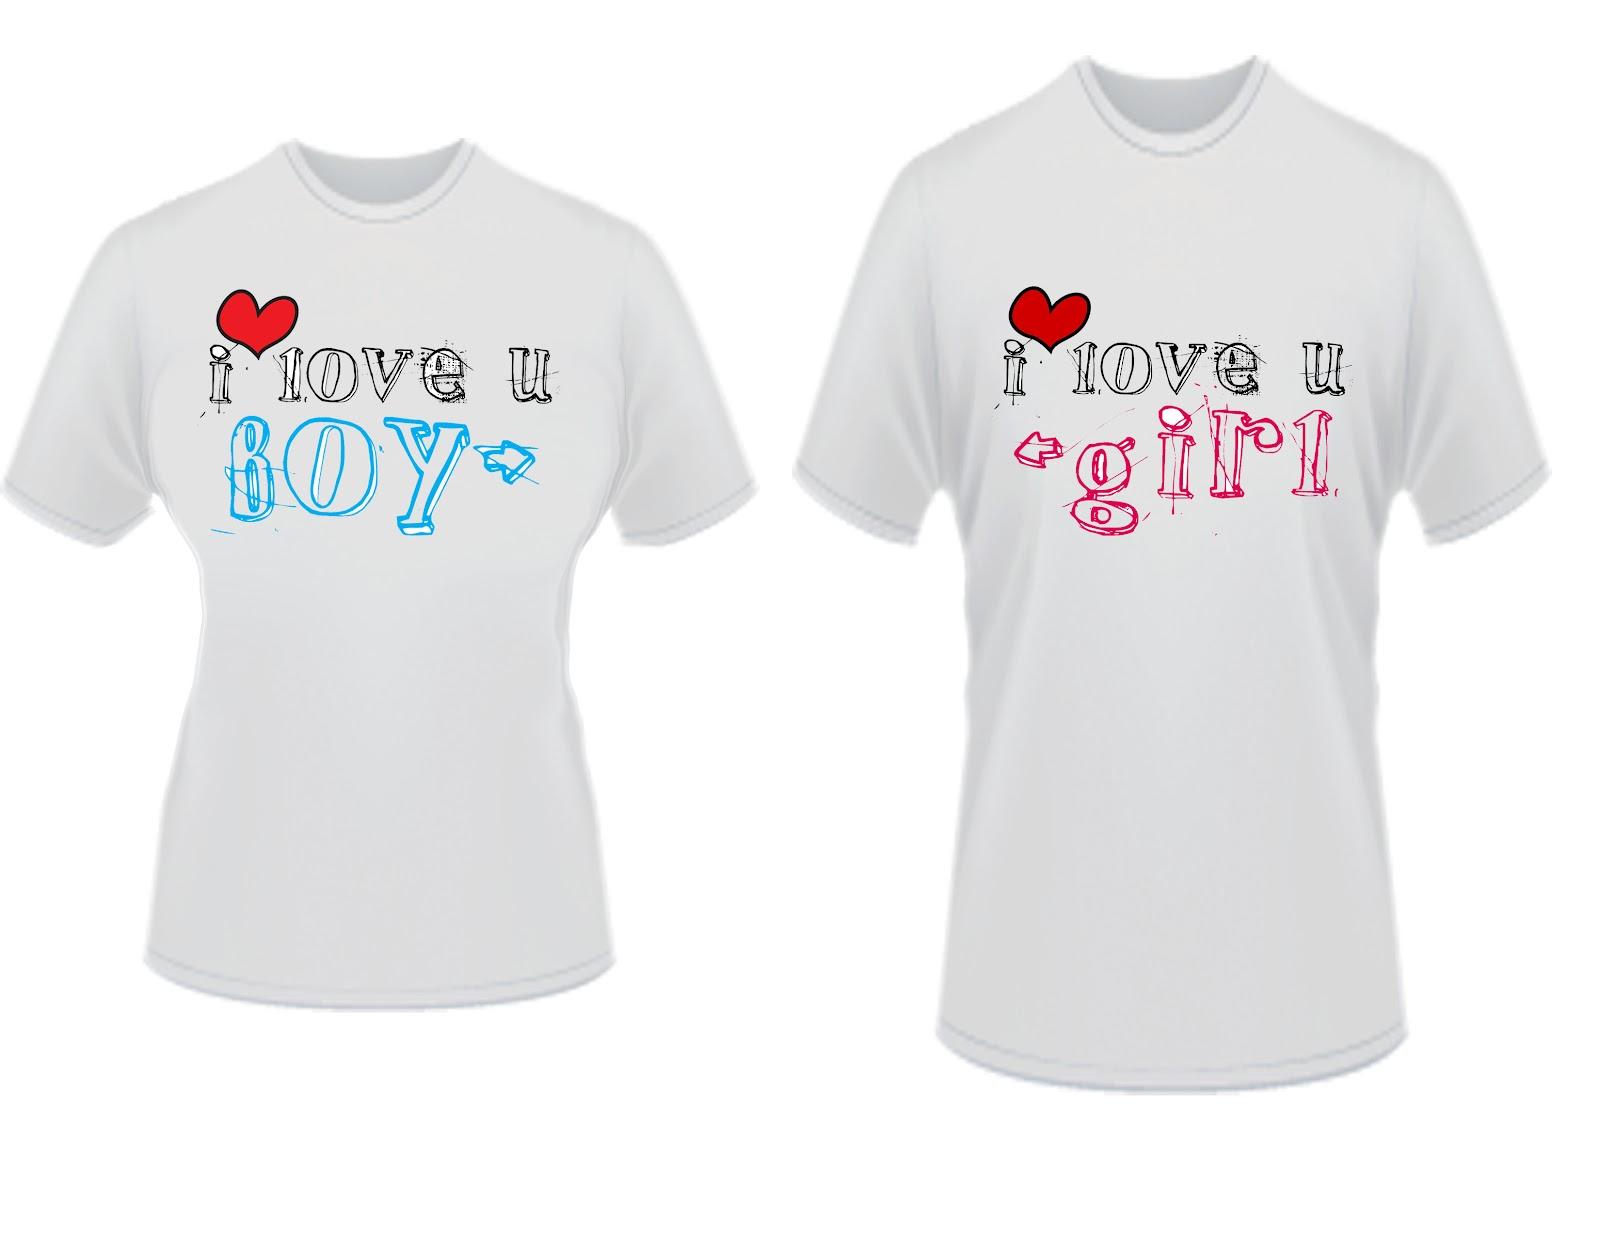 Shirt design for couples - I Love U Boy Girl